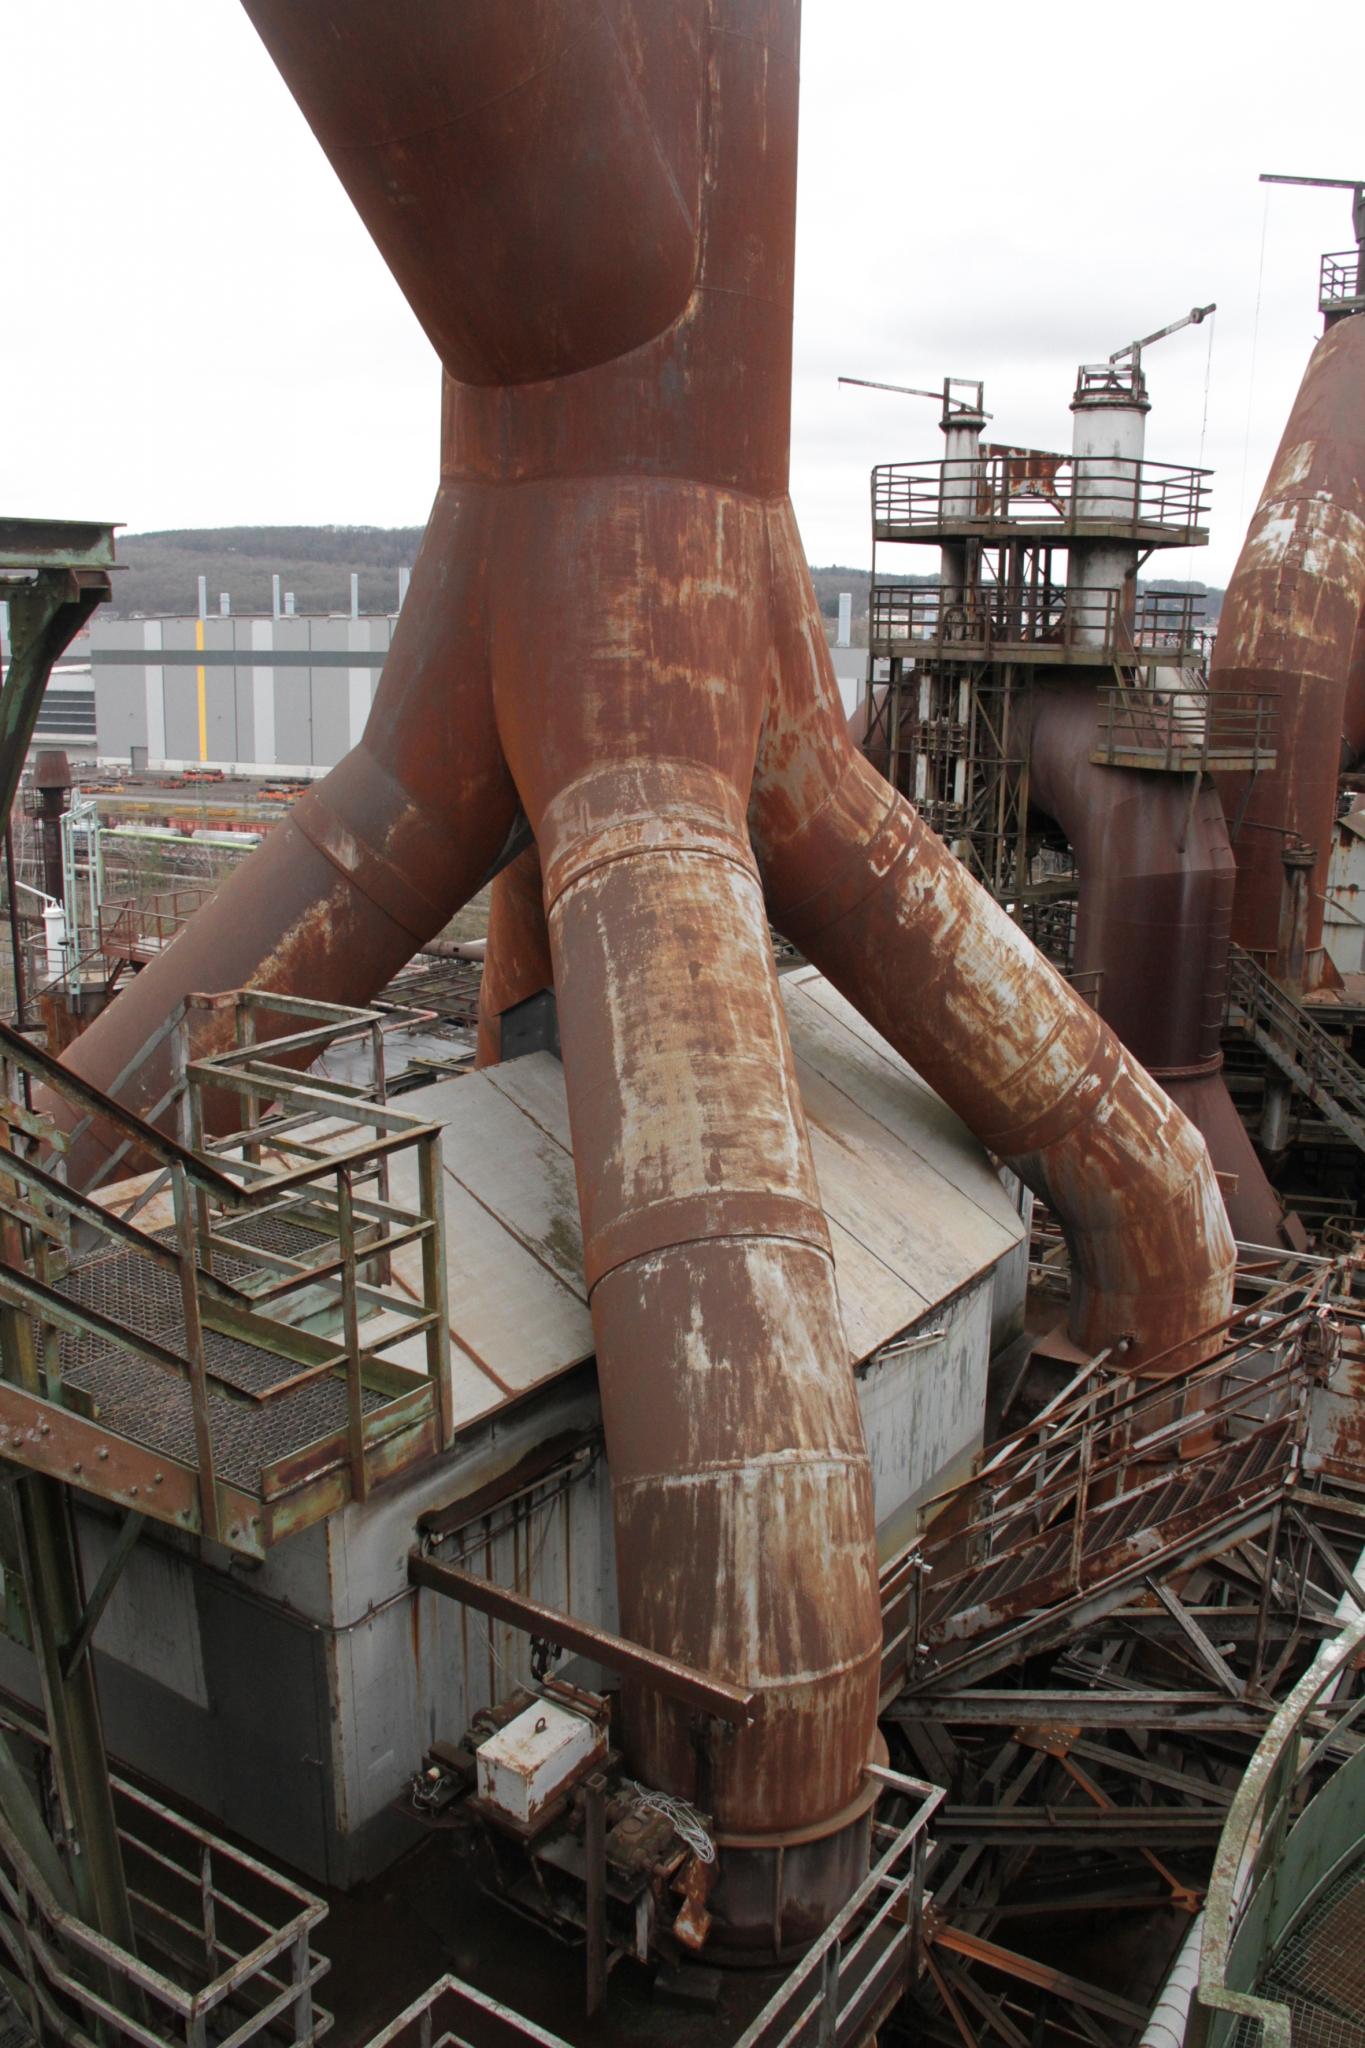 CAHN Guylaine - Expo 2018 - Projection 3 - La main-mise